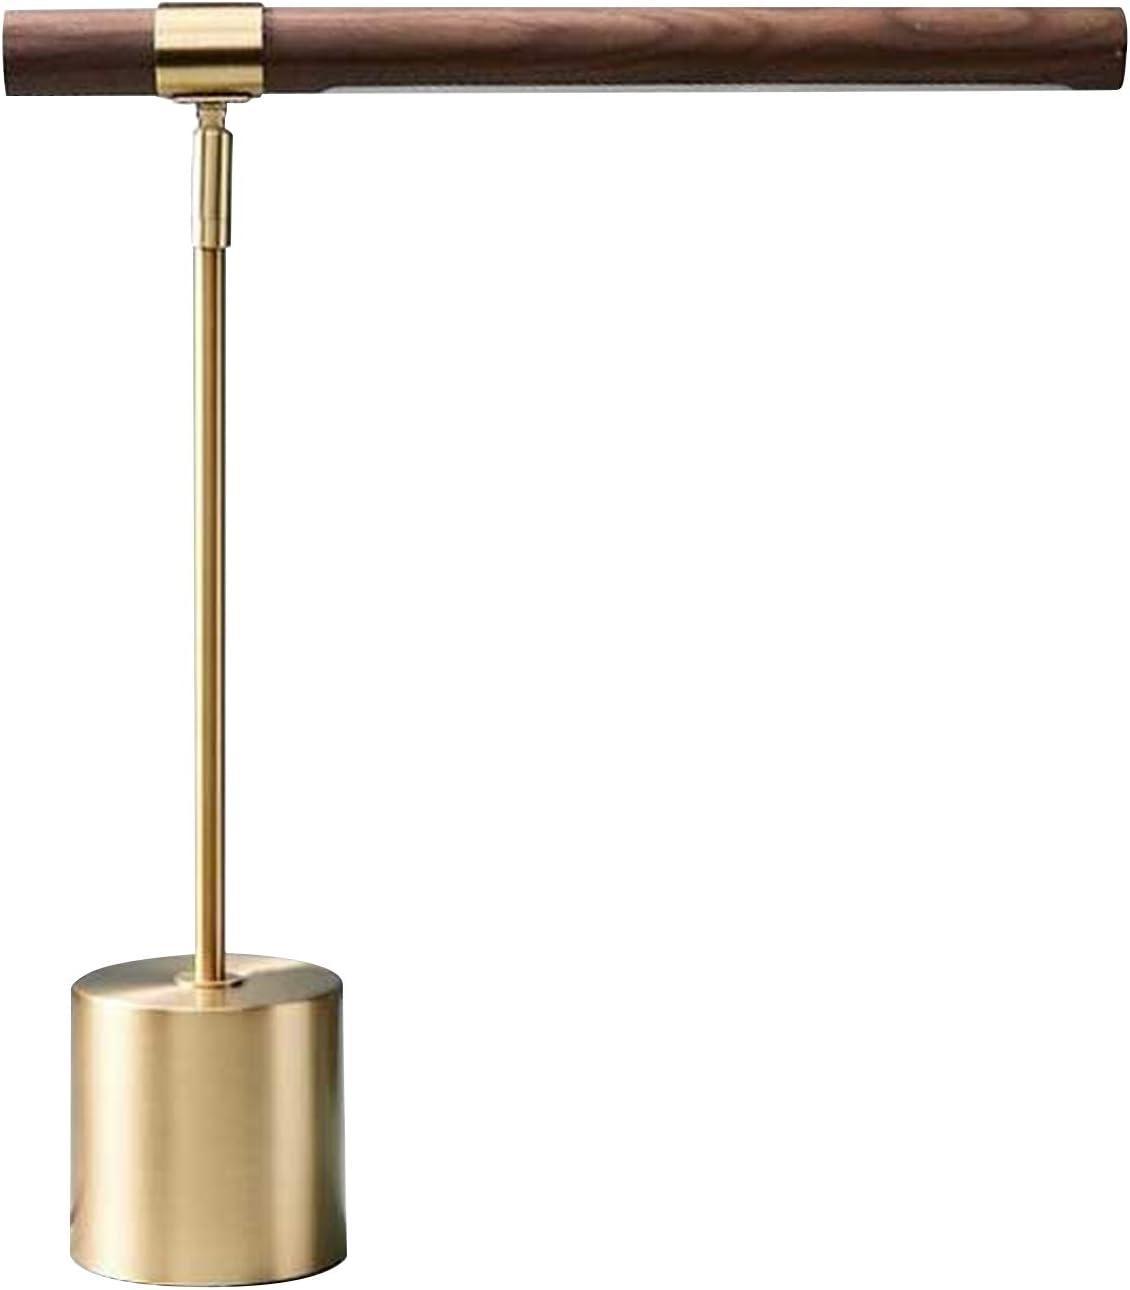 Modern Banker Slim Table Lamp - LED Desk Light - Wood Brass Lamp - Adjustable Modern Table Lamp - Mid Century Desk Lamp for Home Library, Bedside Table, Office Desk - Steampunk MCM Mid Modern Century